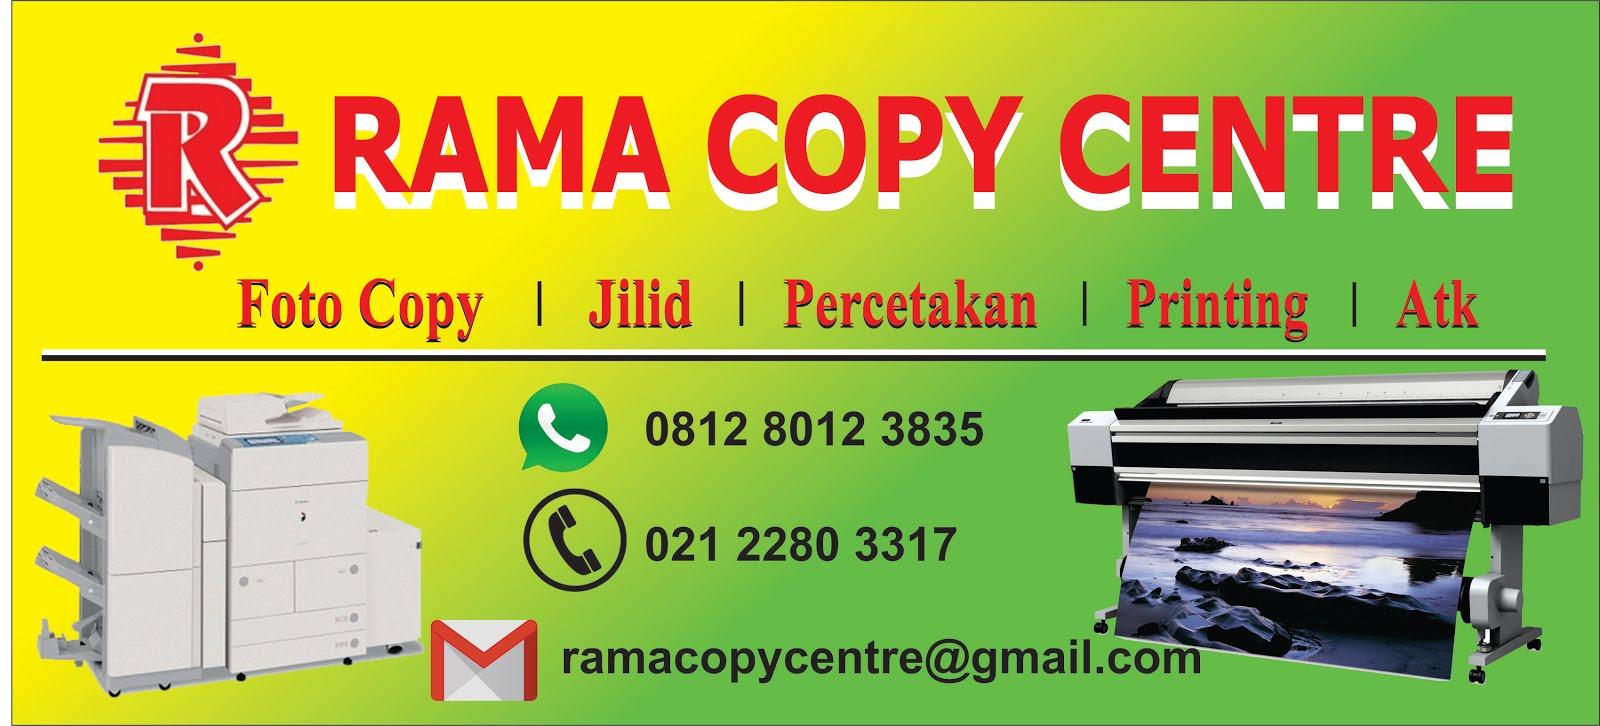 RAMA Copy Centre | Fotocopy | Percetakan | Printing 24 Jam di Jakarta